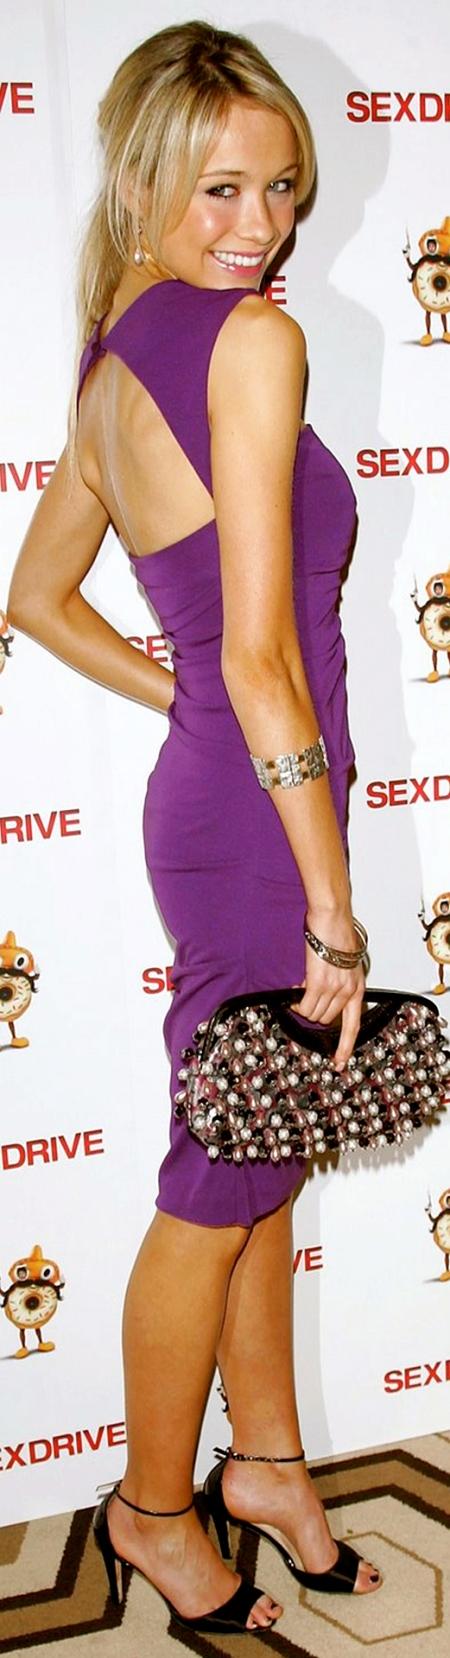 Katrina-Bowden-Women-Celebrity1